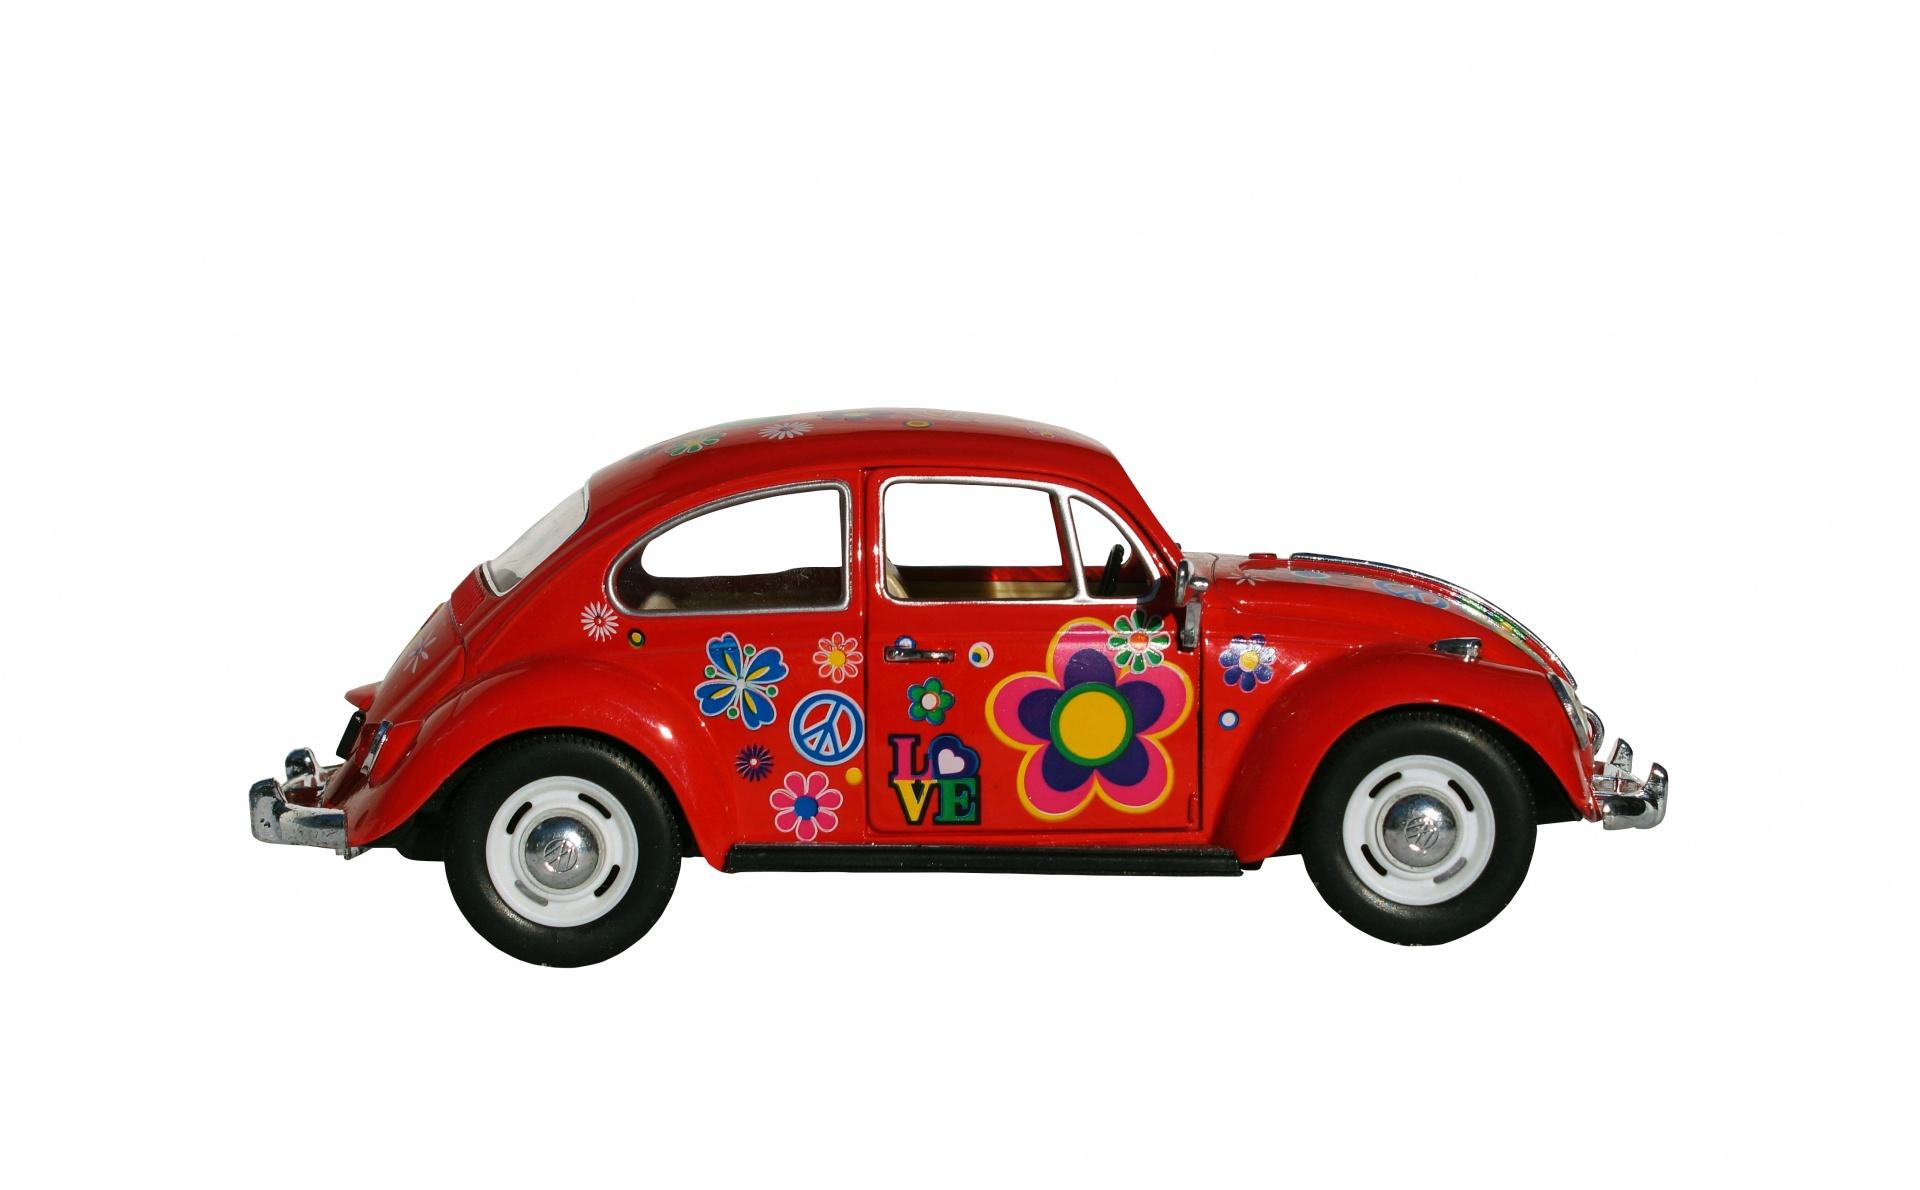 Car Volkswagen Beetle Free Stock Photo Public Domain